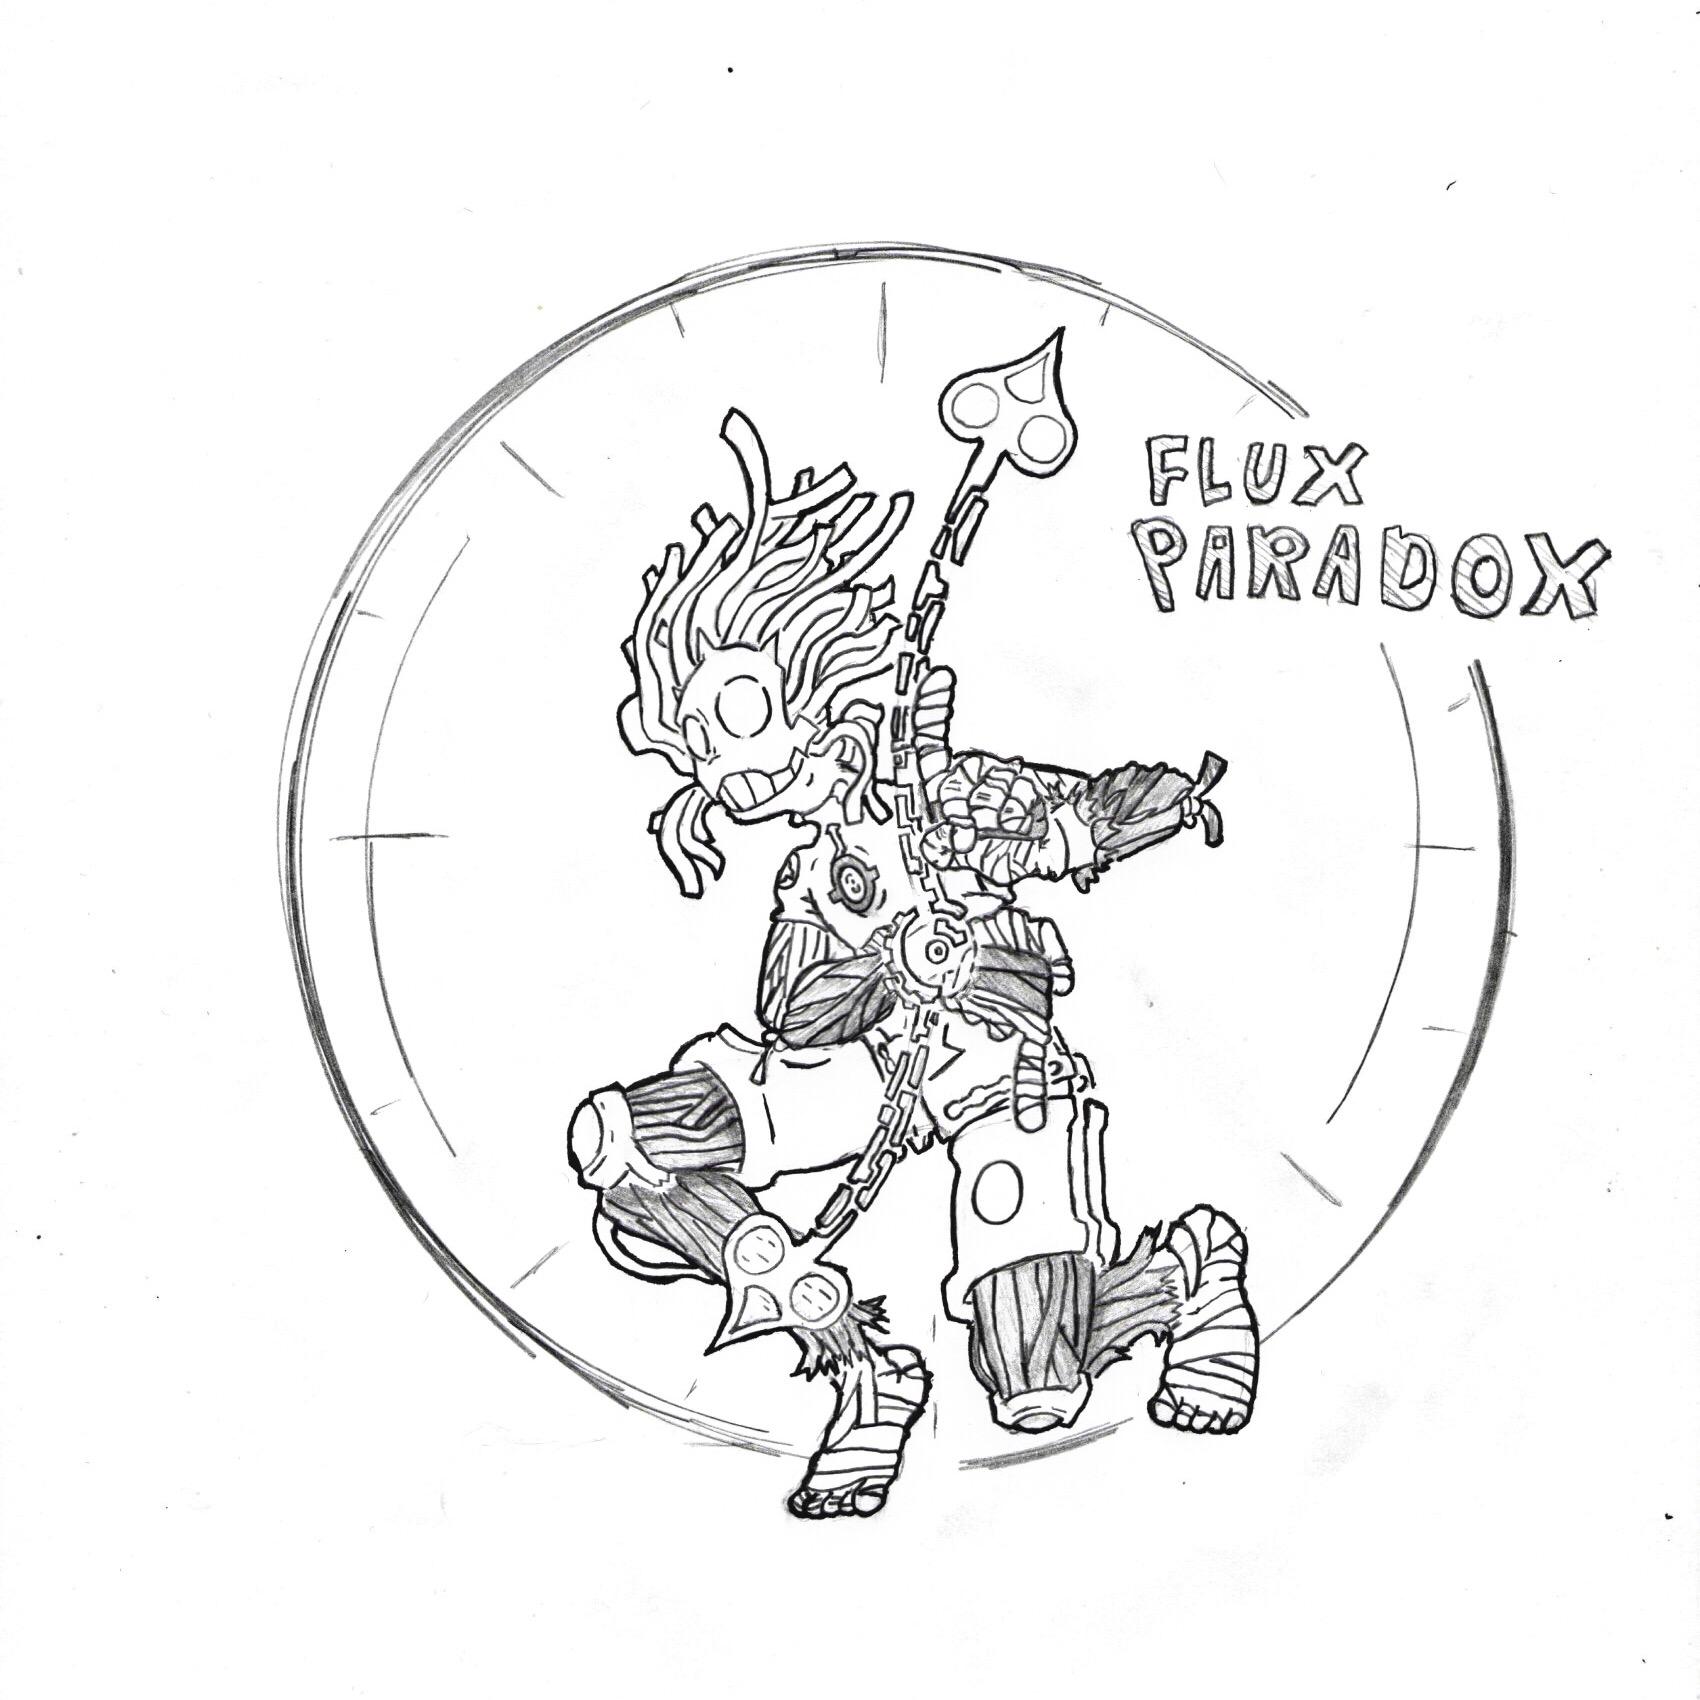 Time Manipulator: Flux Paradox